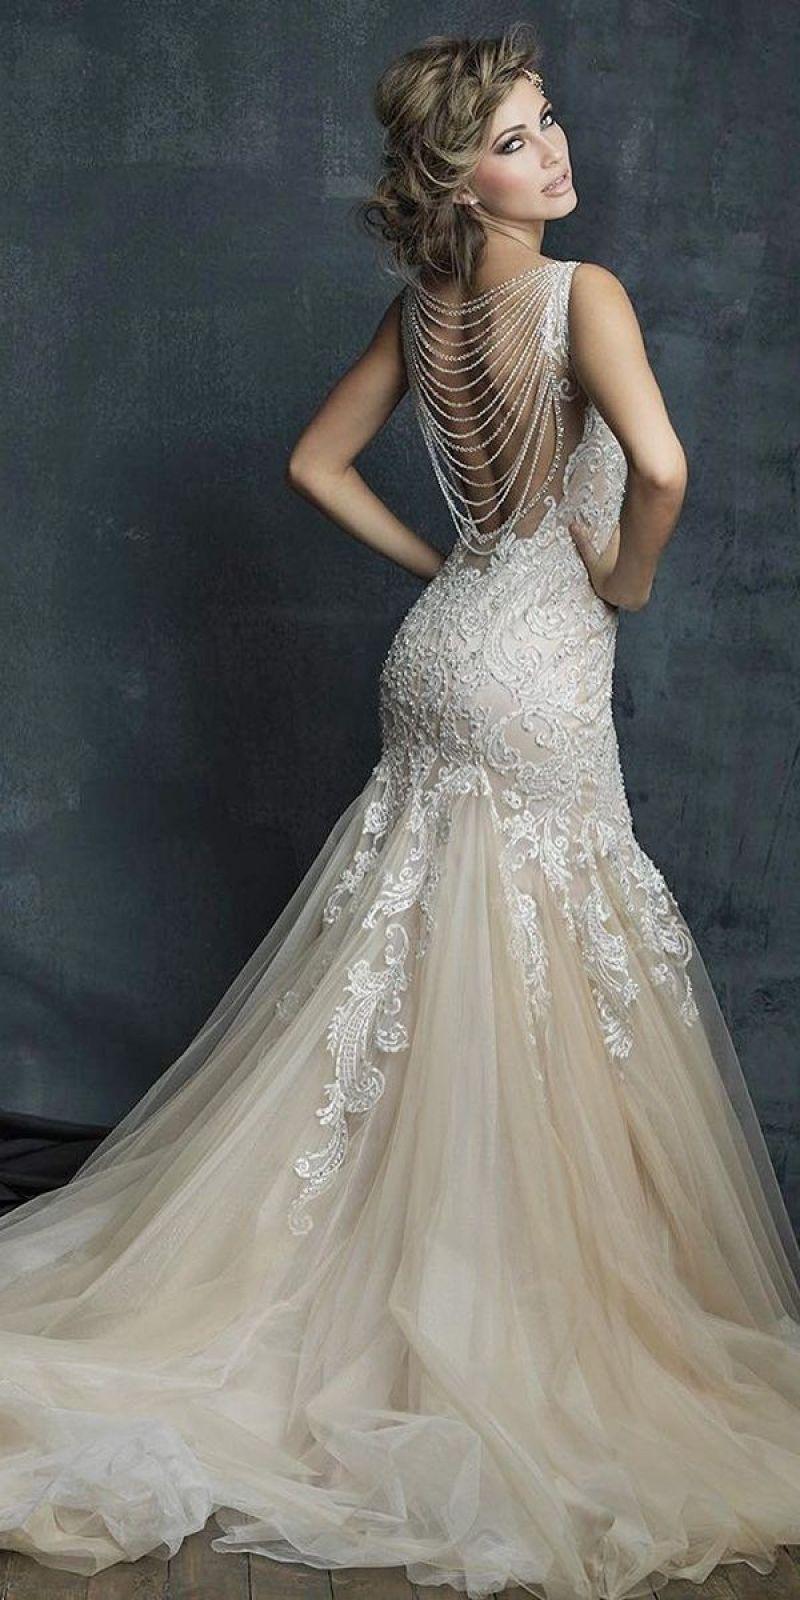 Famousipod Berbagi Informasi Tentang Pertanian Gaun Perkawinan Gaun Pengantin Putri Duyung Gaun Pengantin Brokat